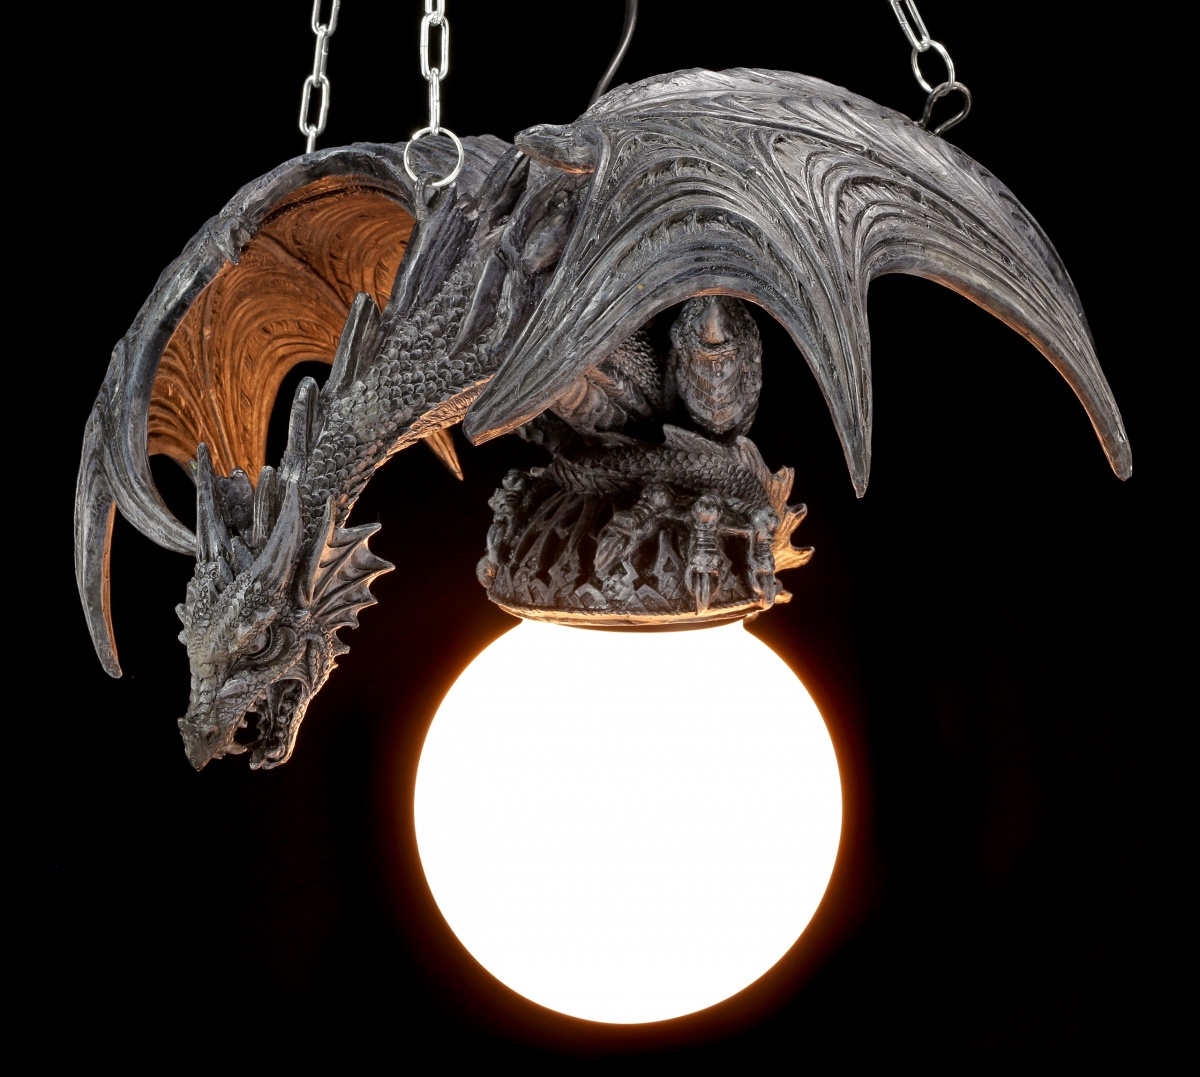 drachenlampe drache im flug lampe deckenlampe gothic figur fantasy ebay. Black Bedroom Furniture Sets. Home Design Ideas